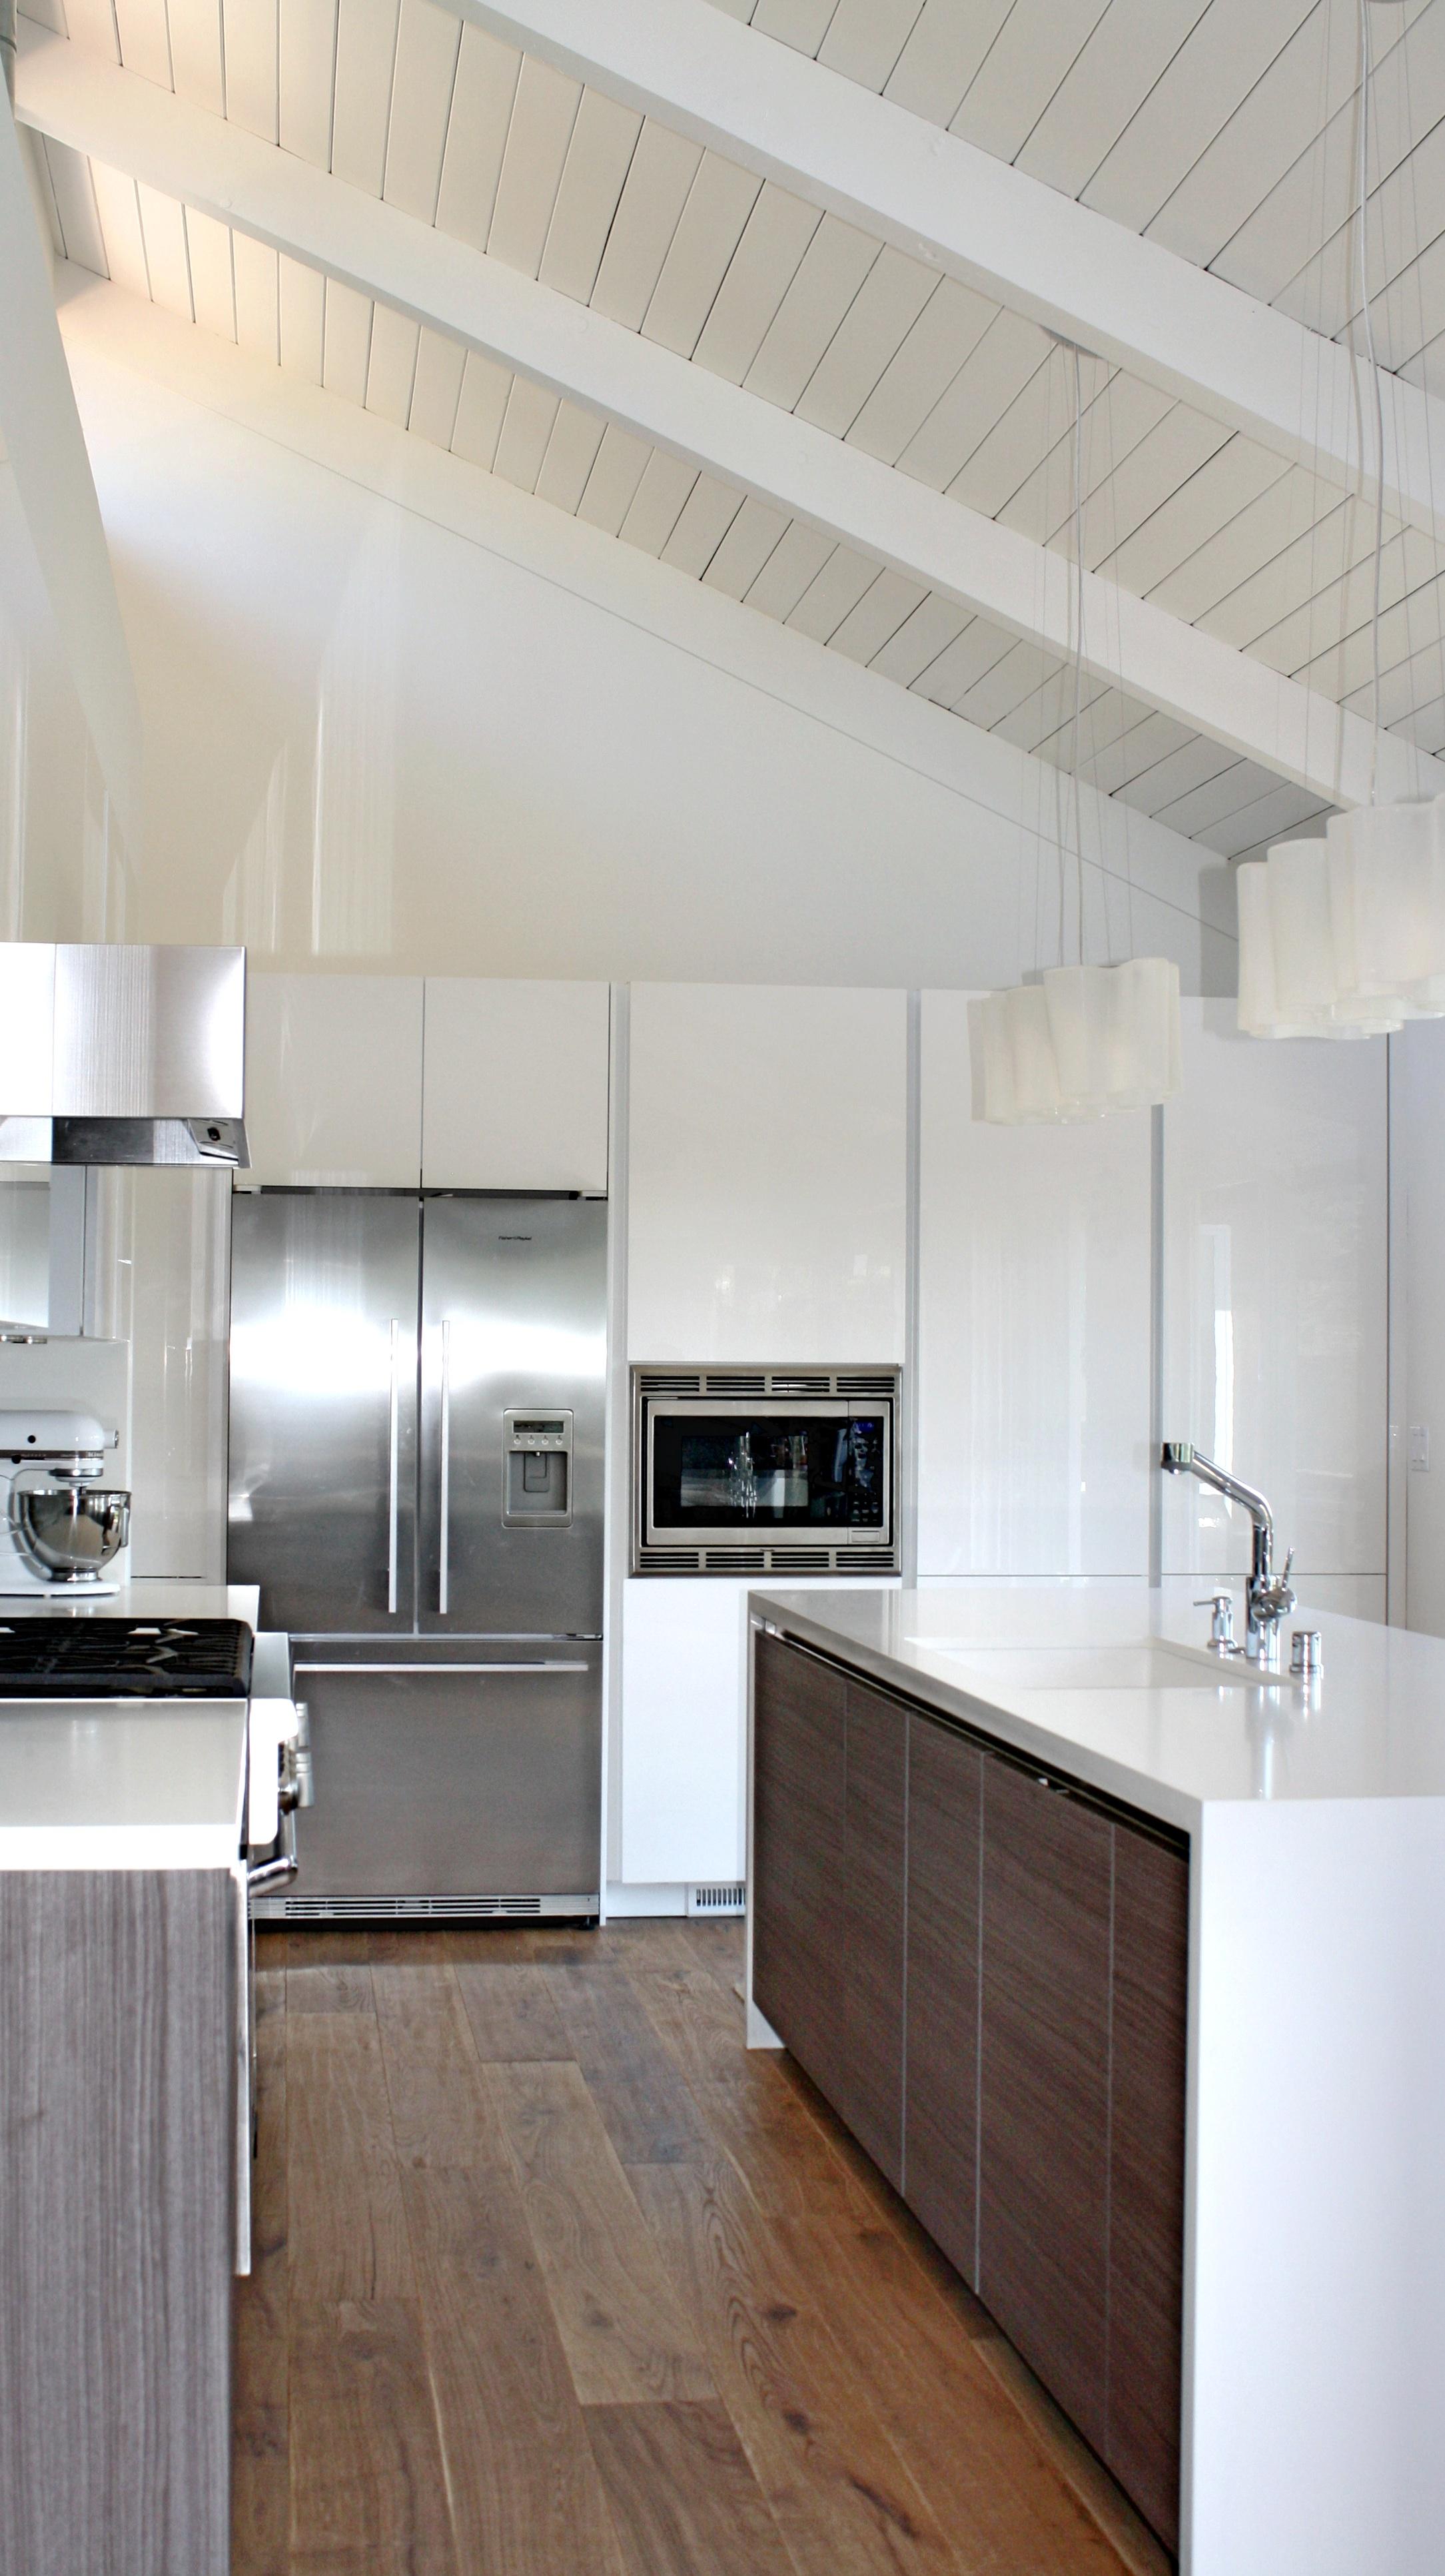 william-adams-design-interior-design-and-architecture-home-remodeling-san-francisco-california-mill-valley-mid-century-kitchen-design-white-grey-wood-flooring-3.jpg